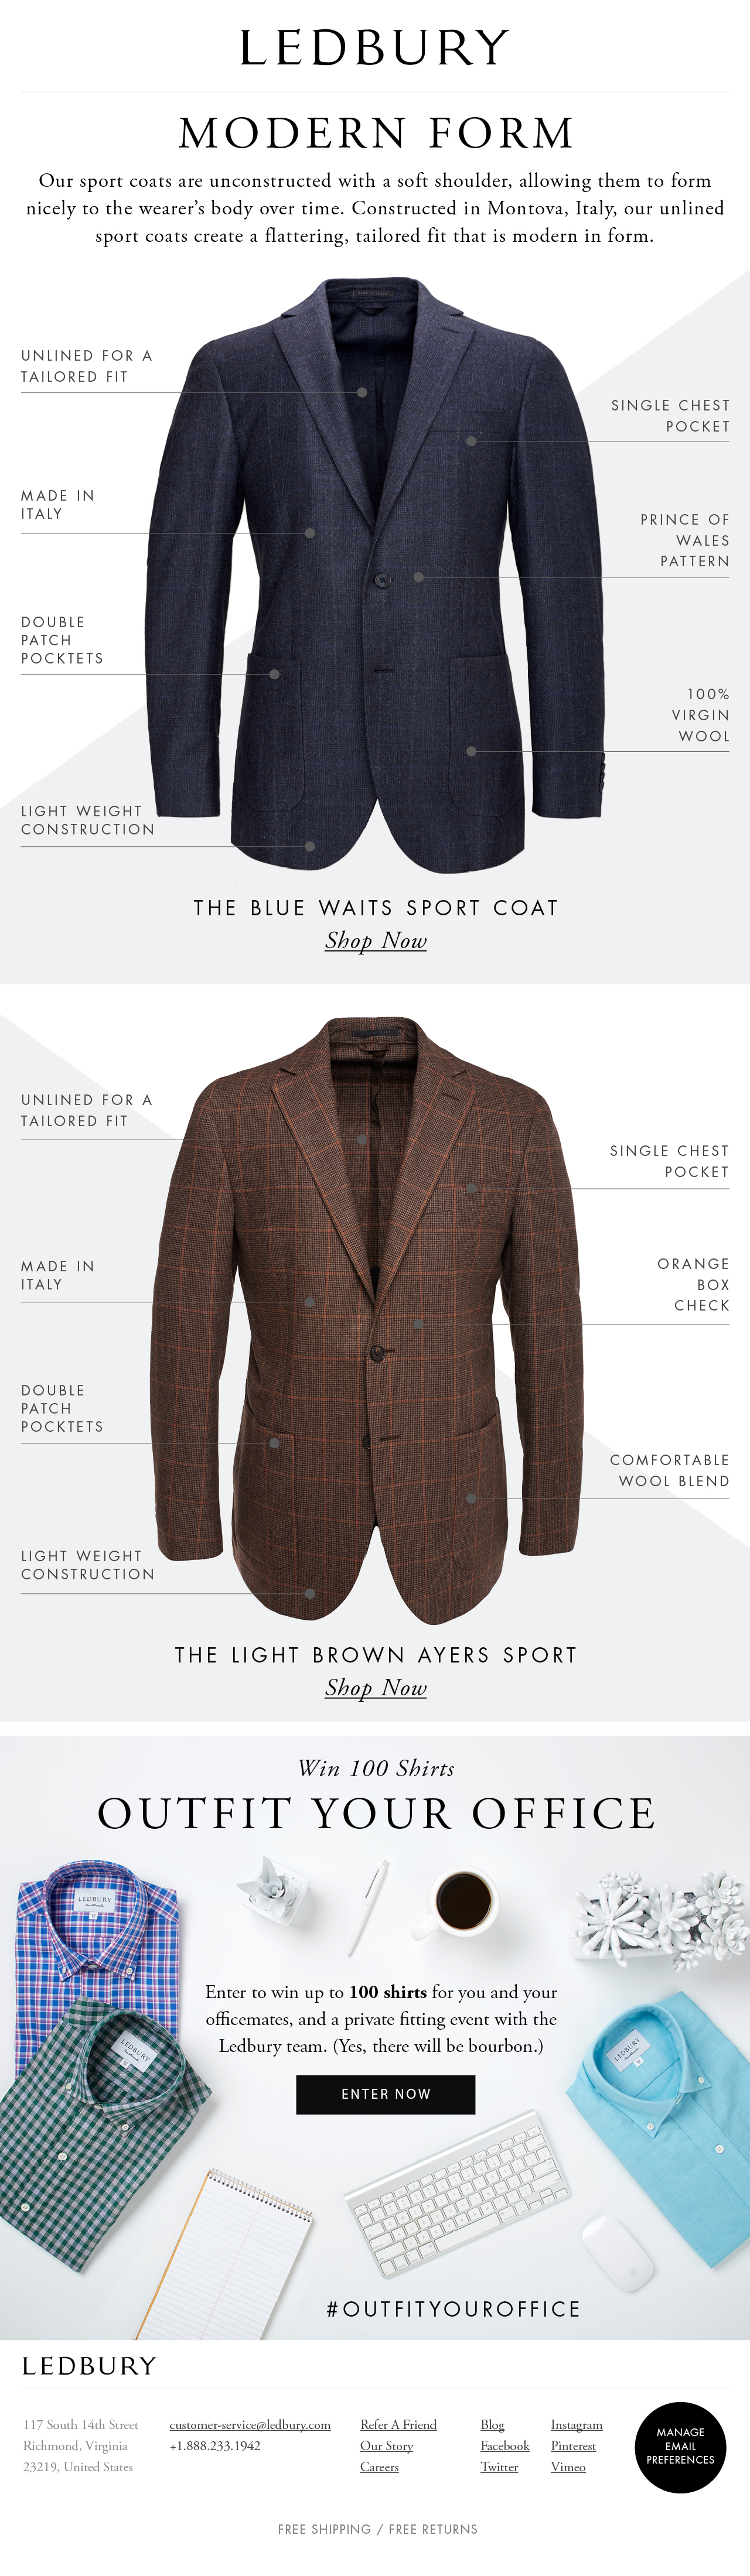 2015.04.10 Sport Coats.jpg